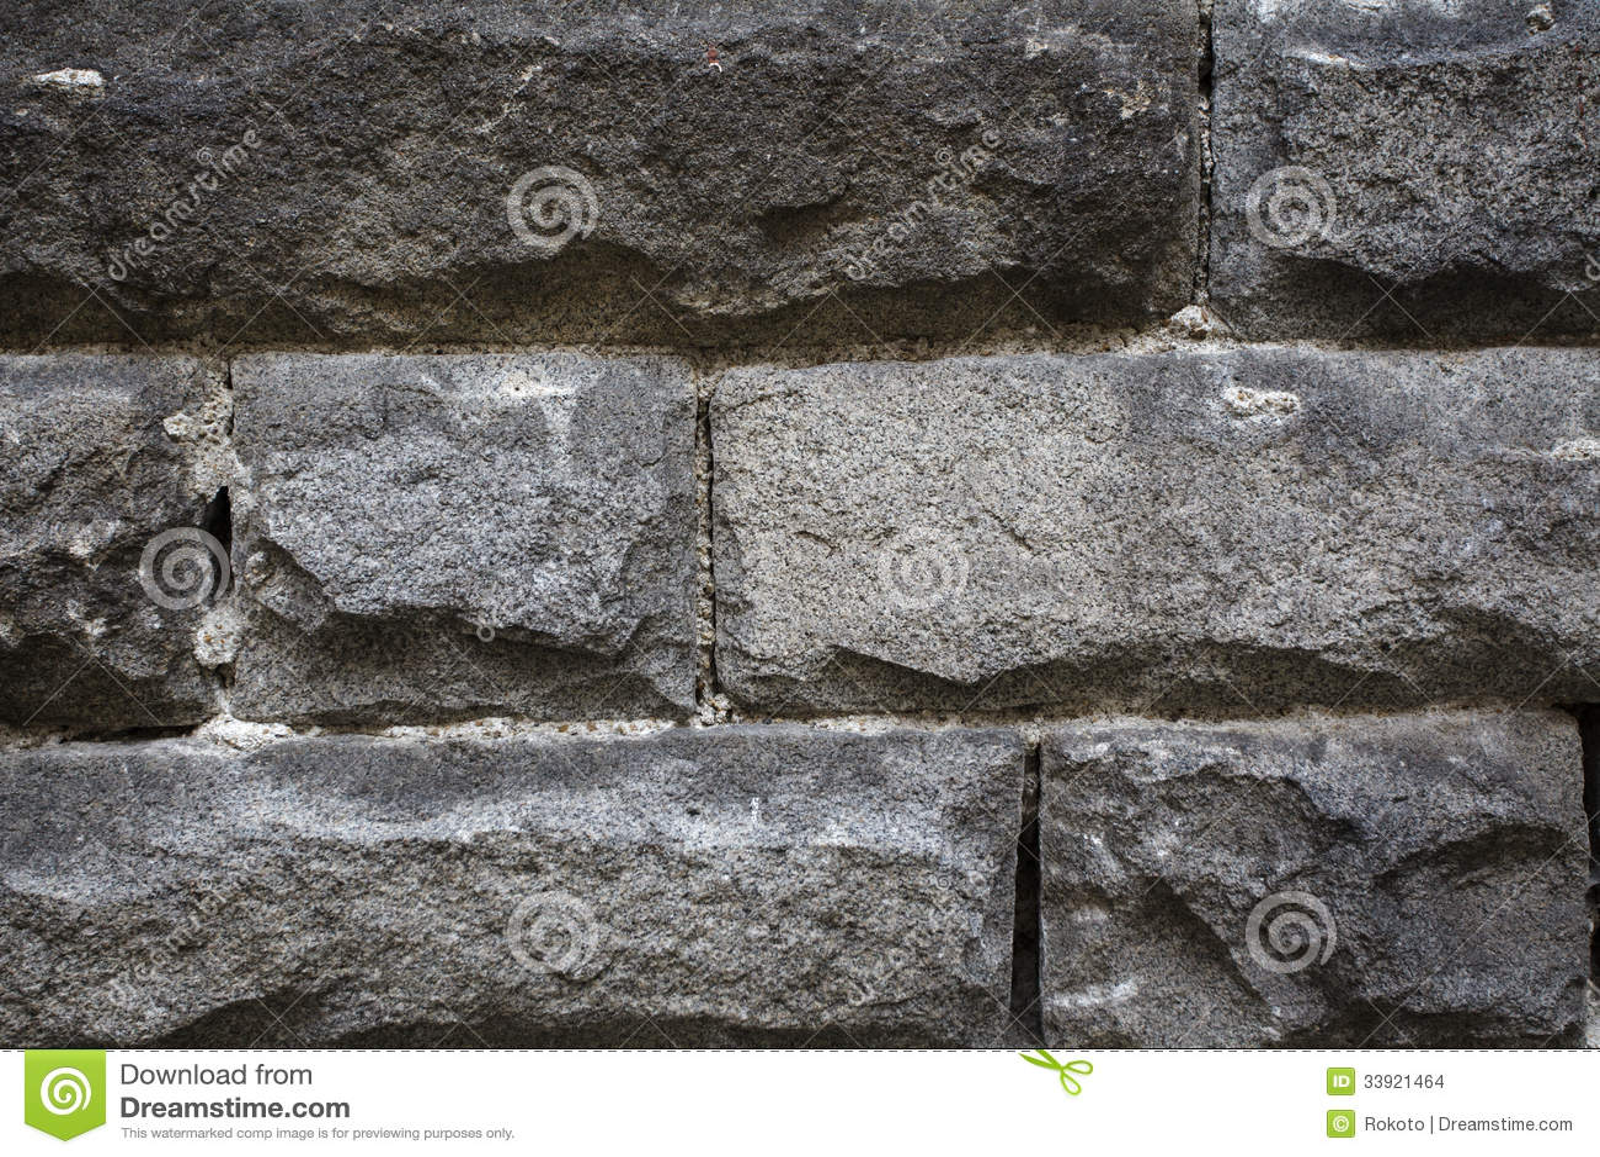 Rough Granite Stone : Rough granite stone wall stock images image